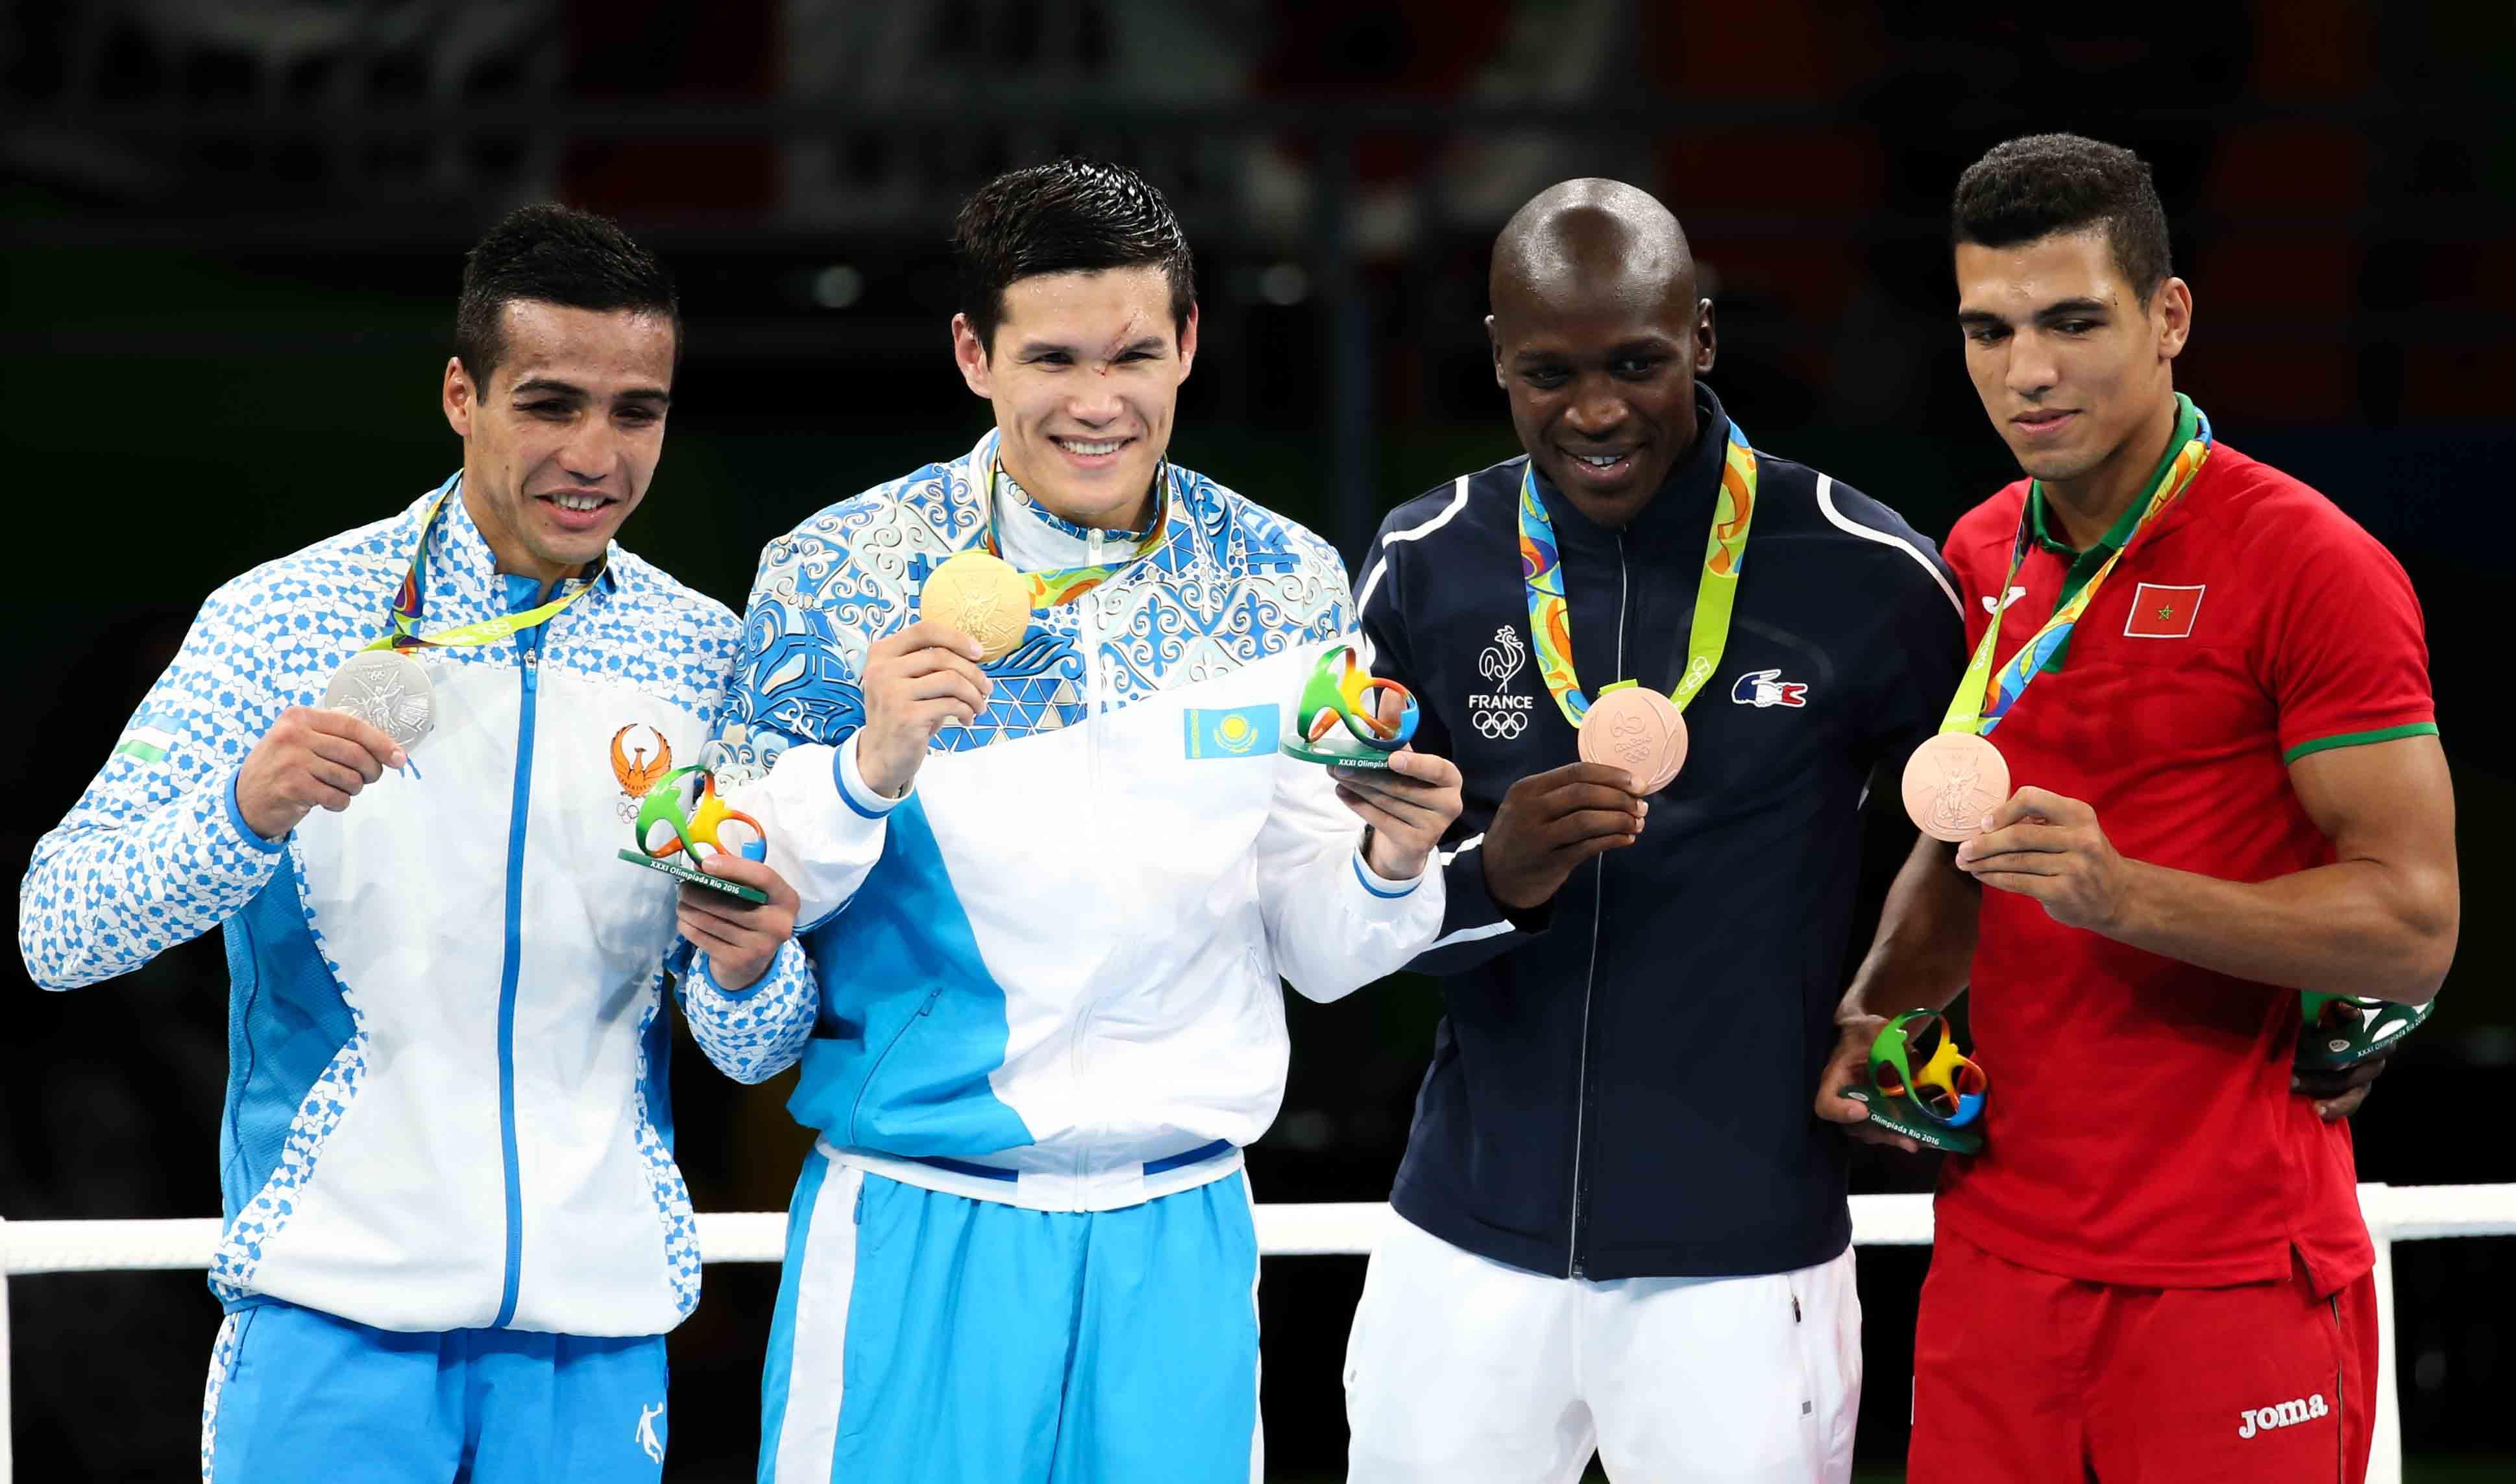 тут олимпийские чемпионы казахстана в рио фото самокате попал